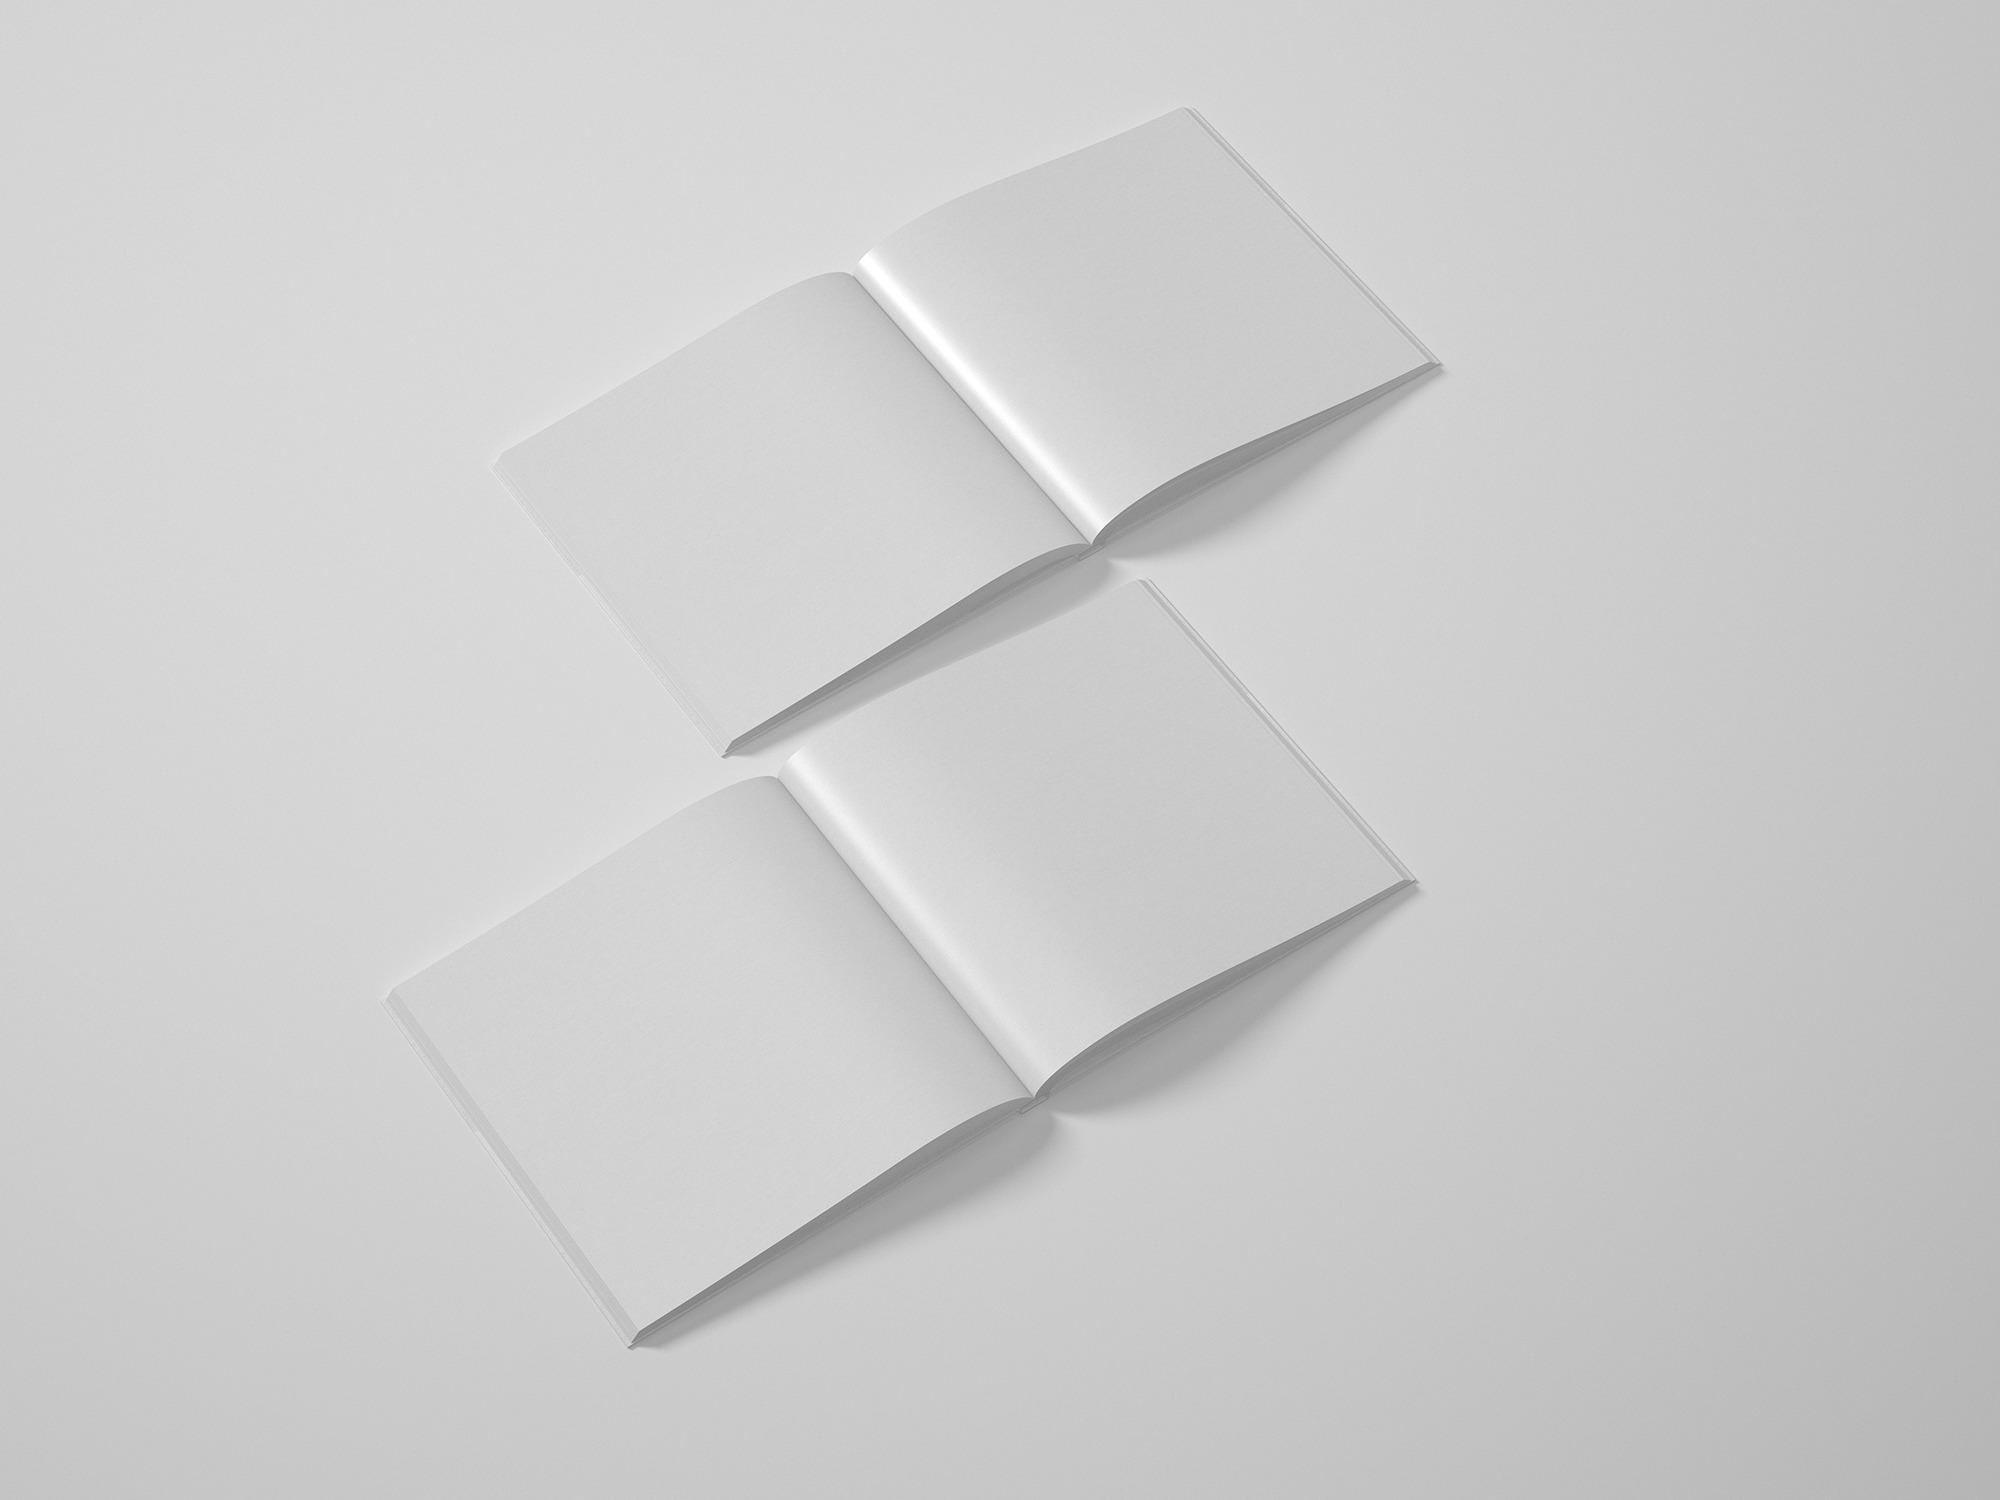 Free Square Catalog Mockup